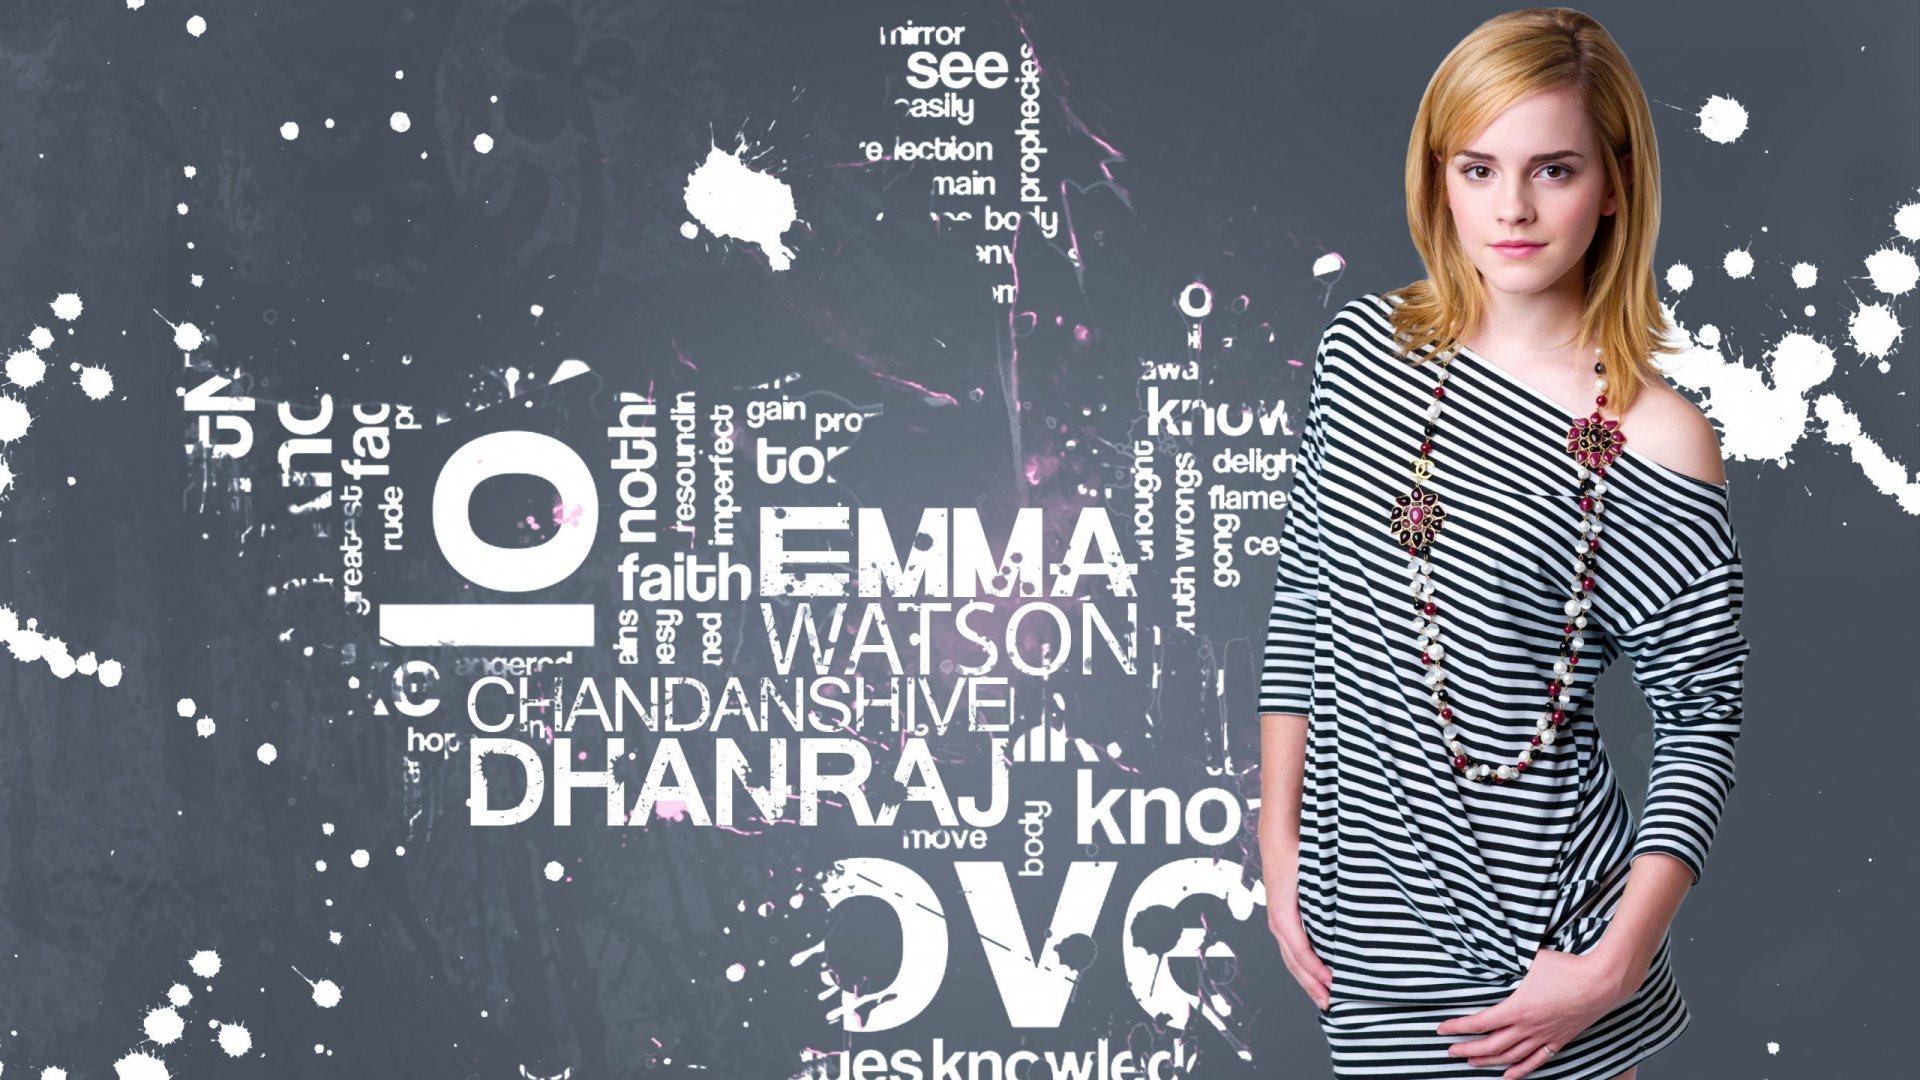 Emma Watson Hd Wallpapers 1080P   1398967 1920x1080